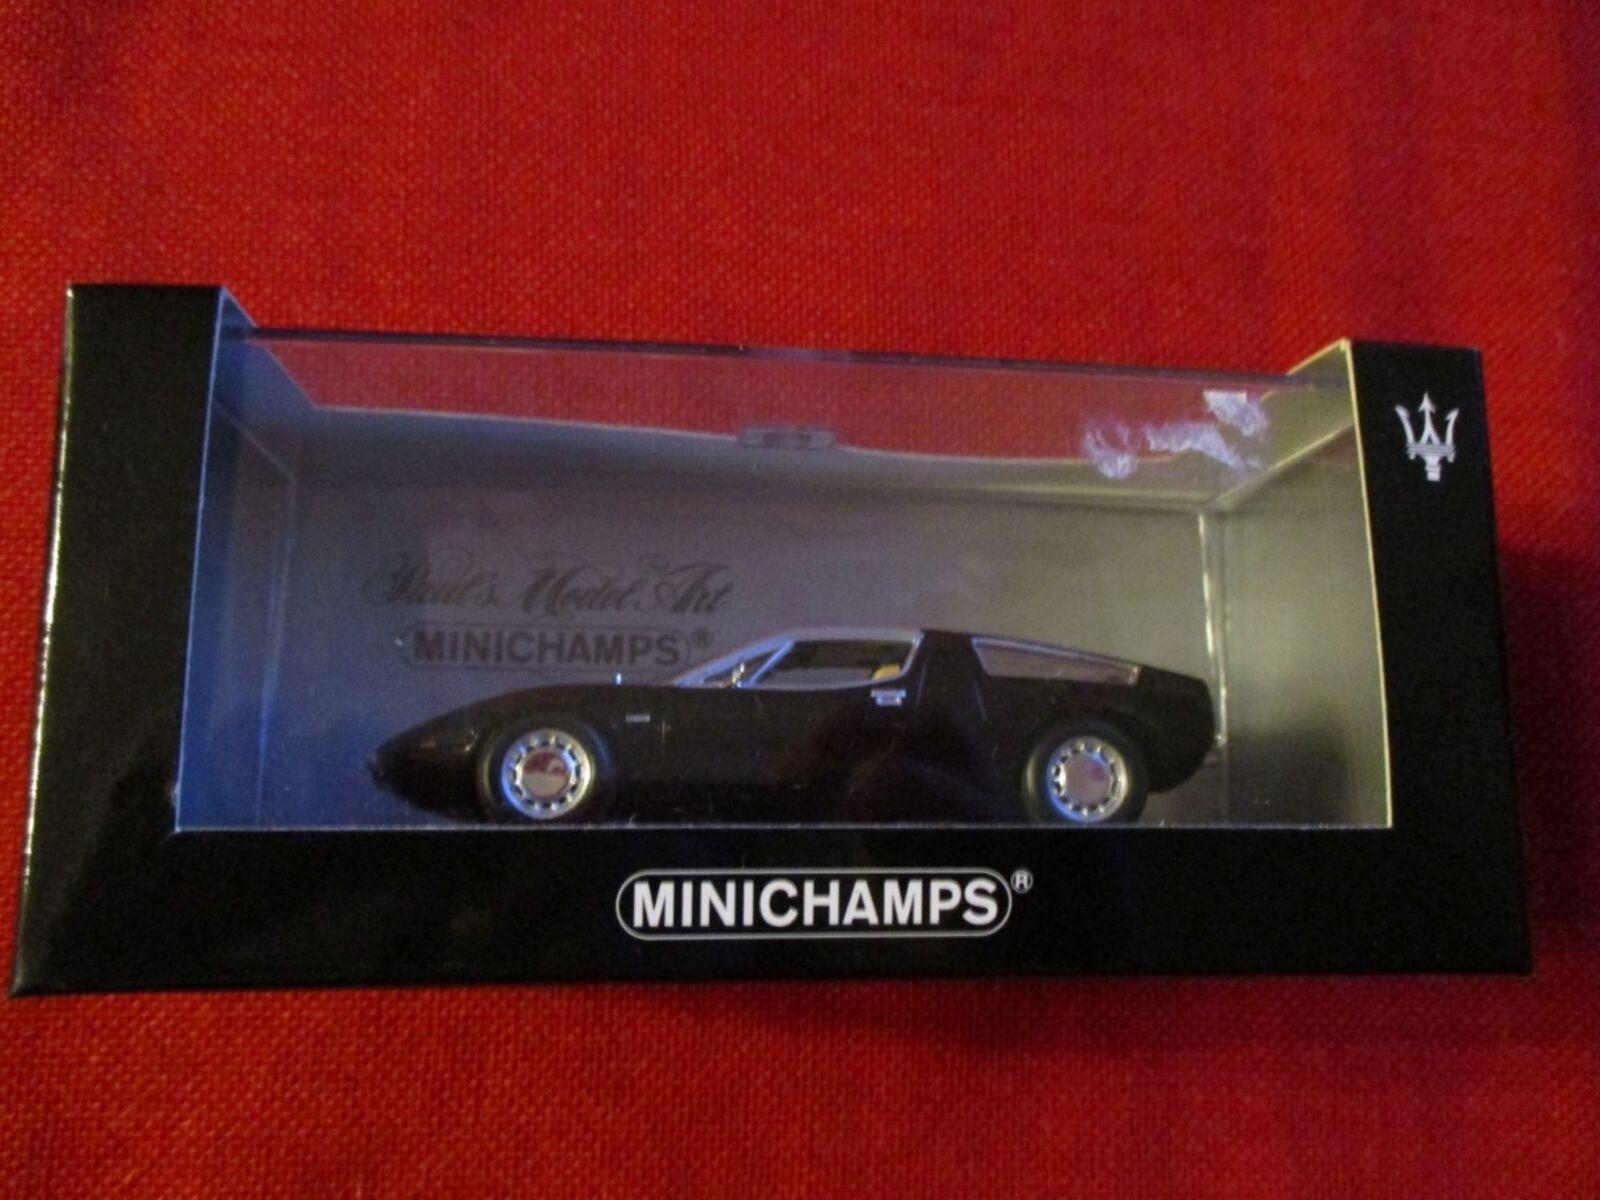 MINICHAMPS® 400 123400 1 43 Maserati Bora 1972 schwarz NEU OVP  | Vogue